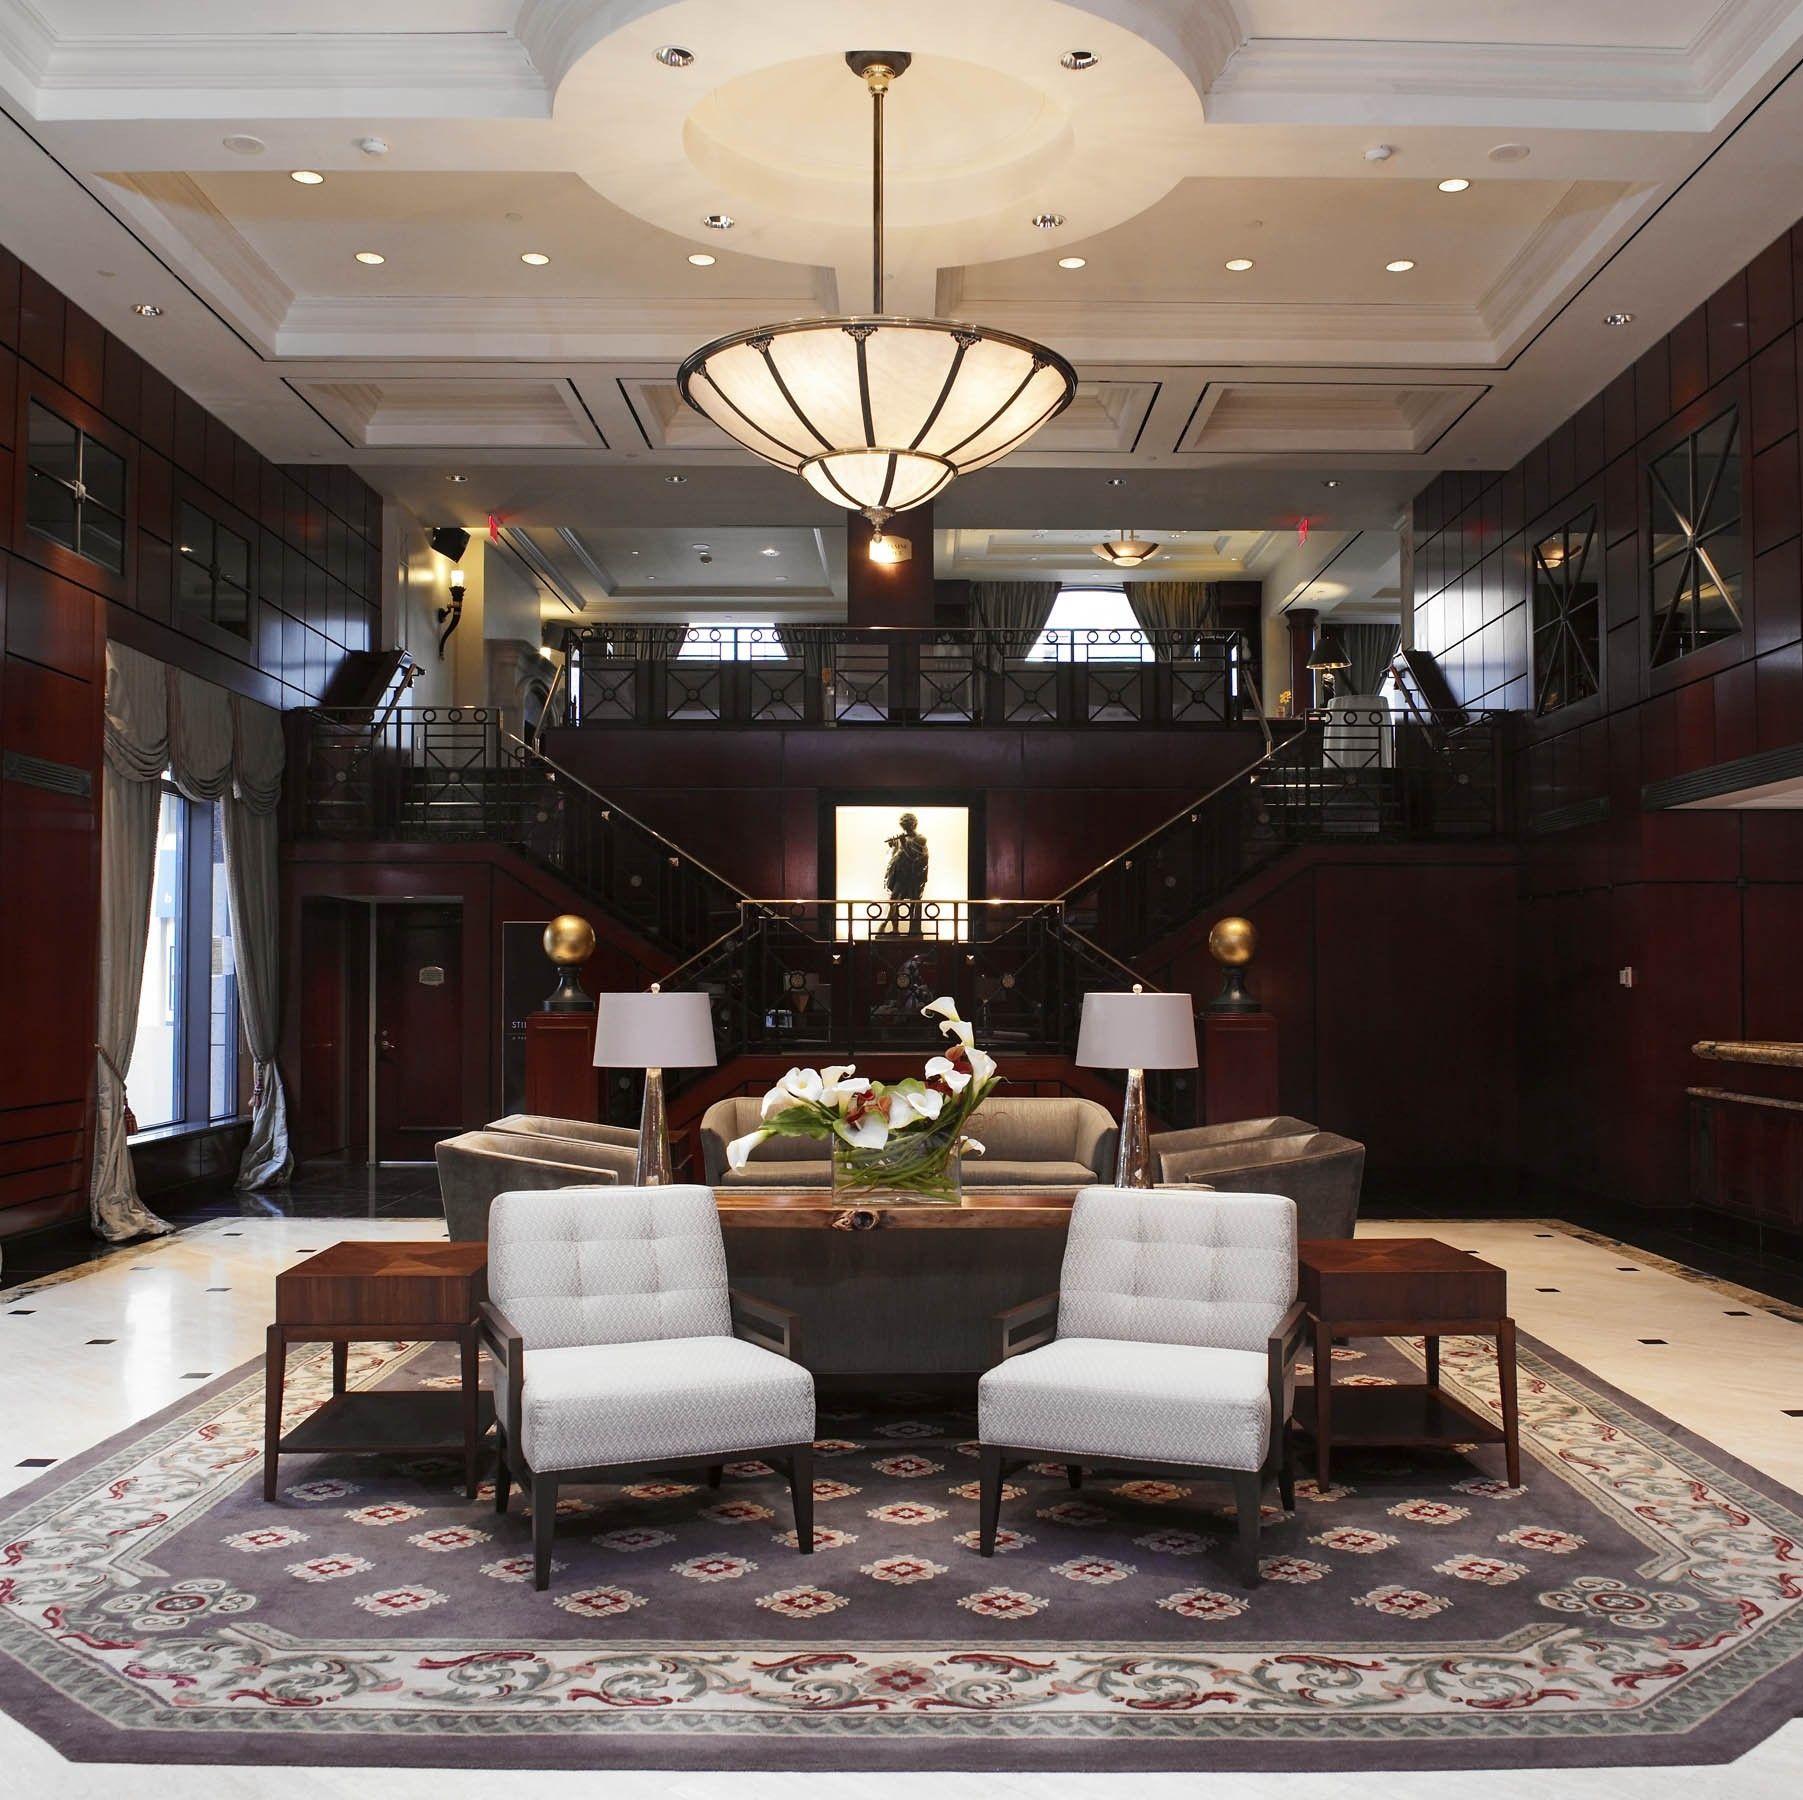 Park Hyatt Hotel Hotels Directory Bloor Yorkville Toronto